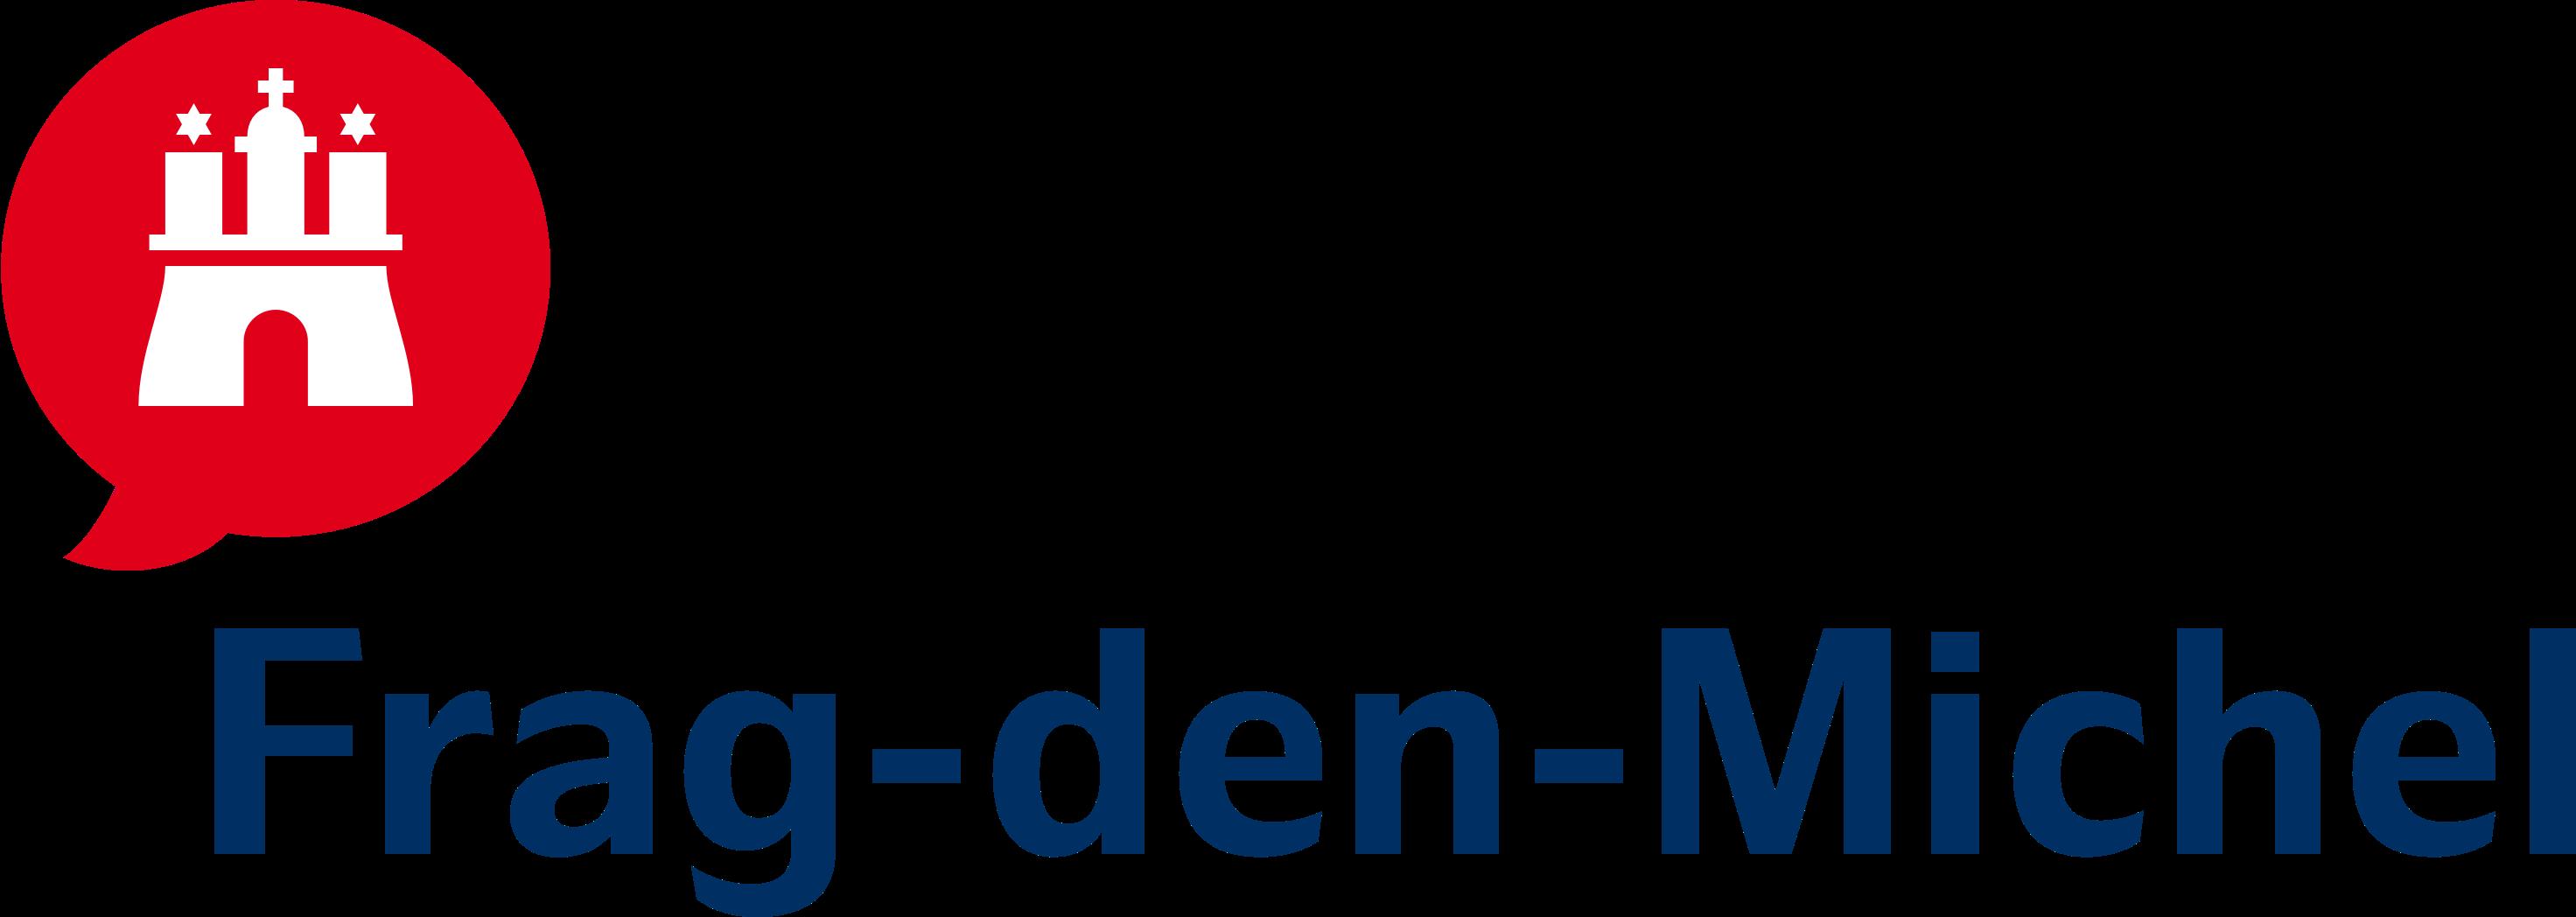 frag-den-michel-logo